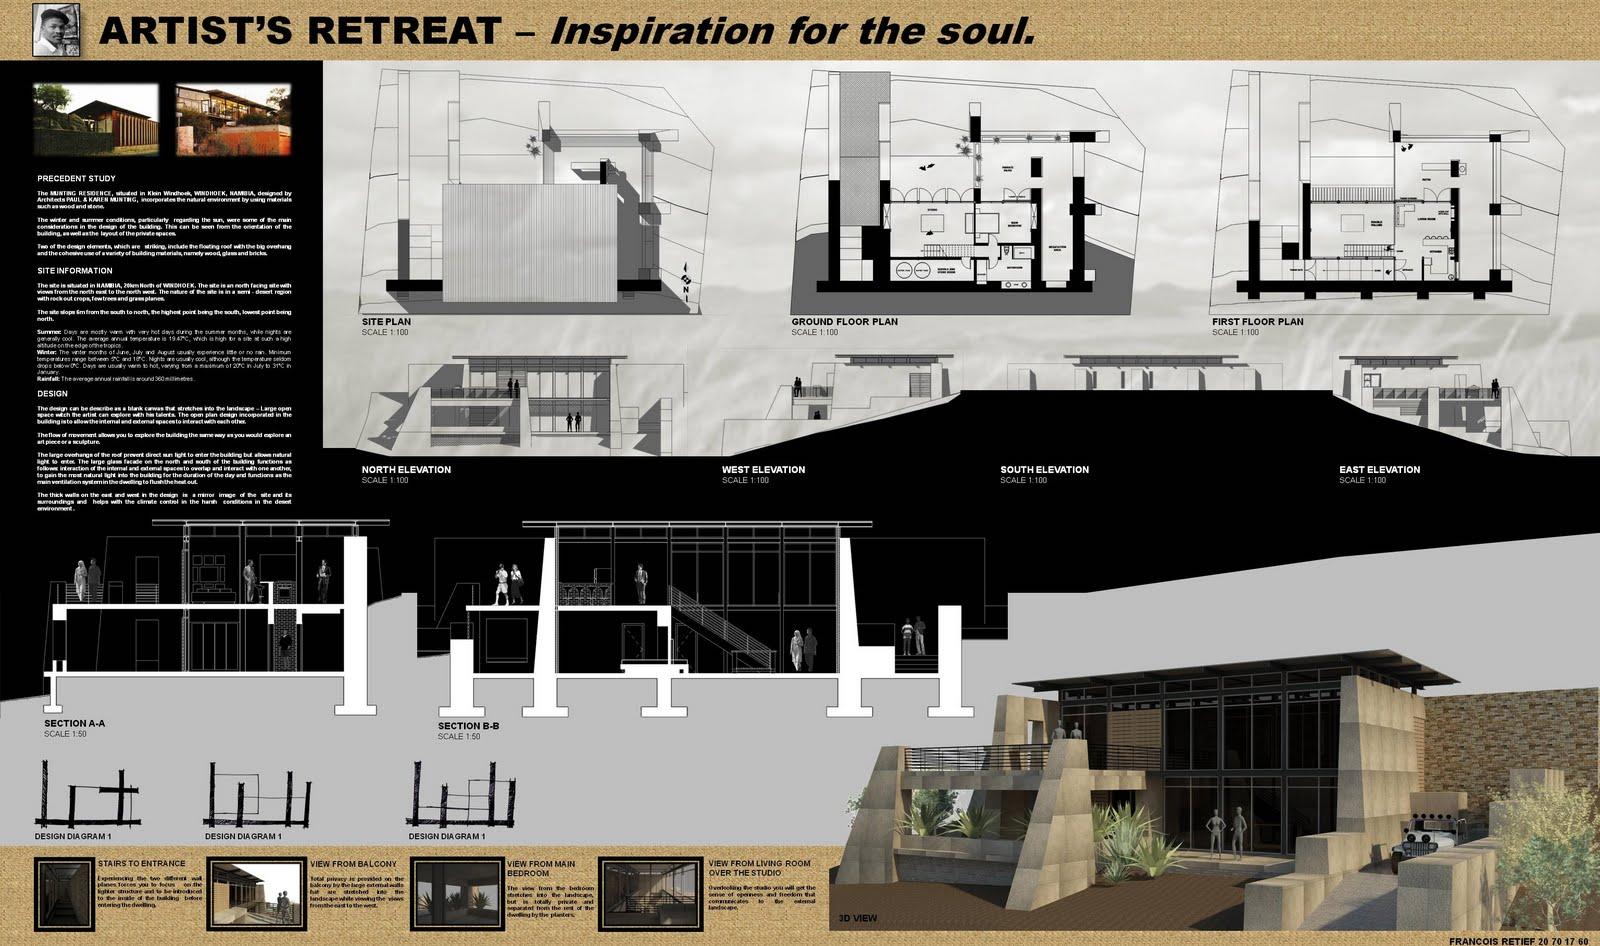 francois retief architecture  artist retreat